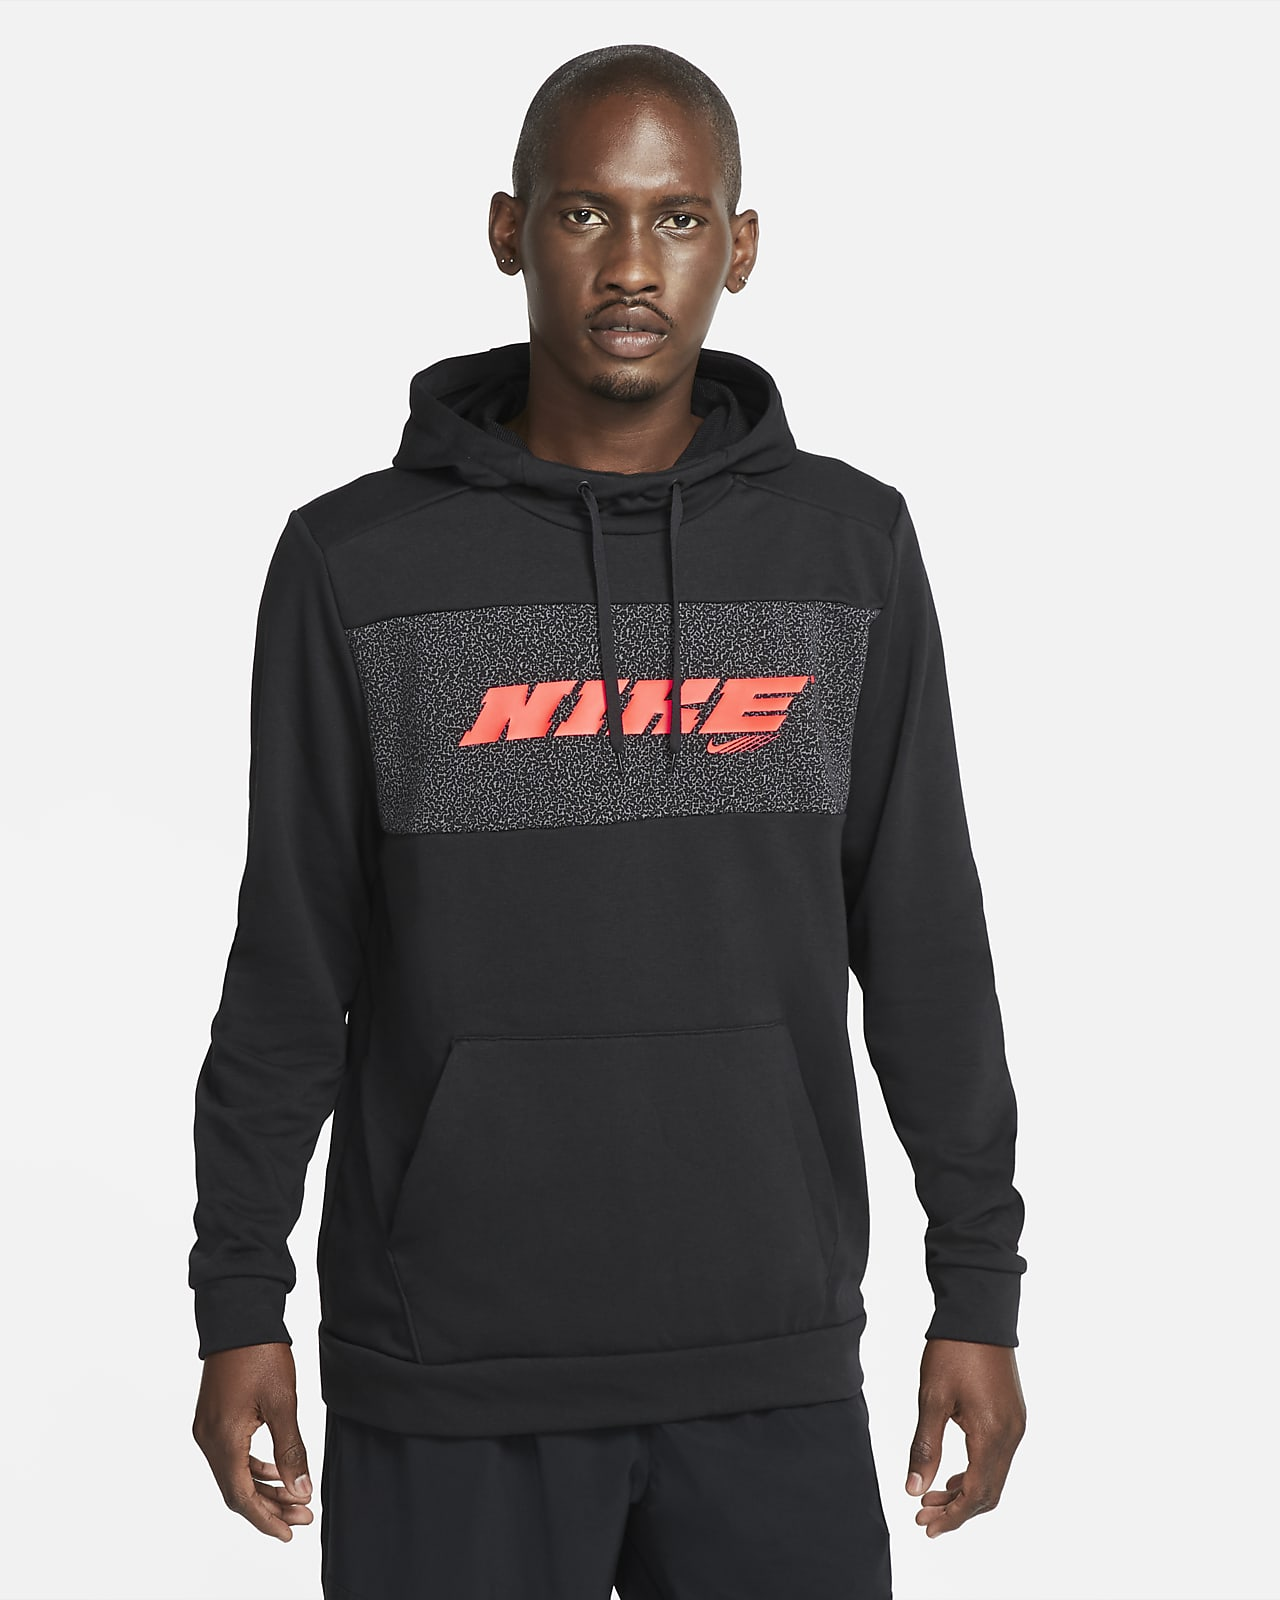 Nike Dri-FIT Sport Clash Trainings-Hoodie für Herren